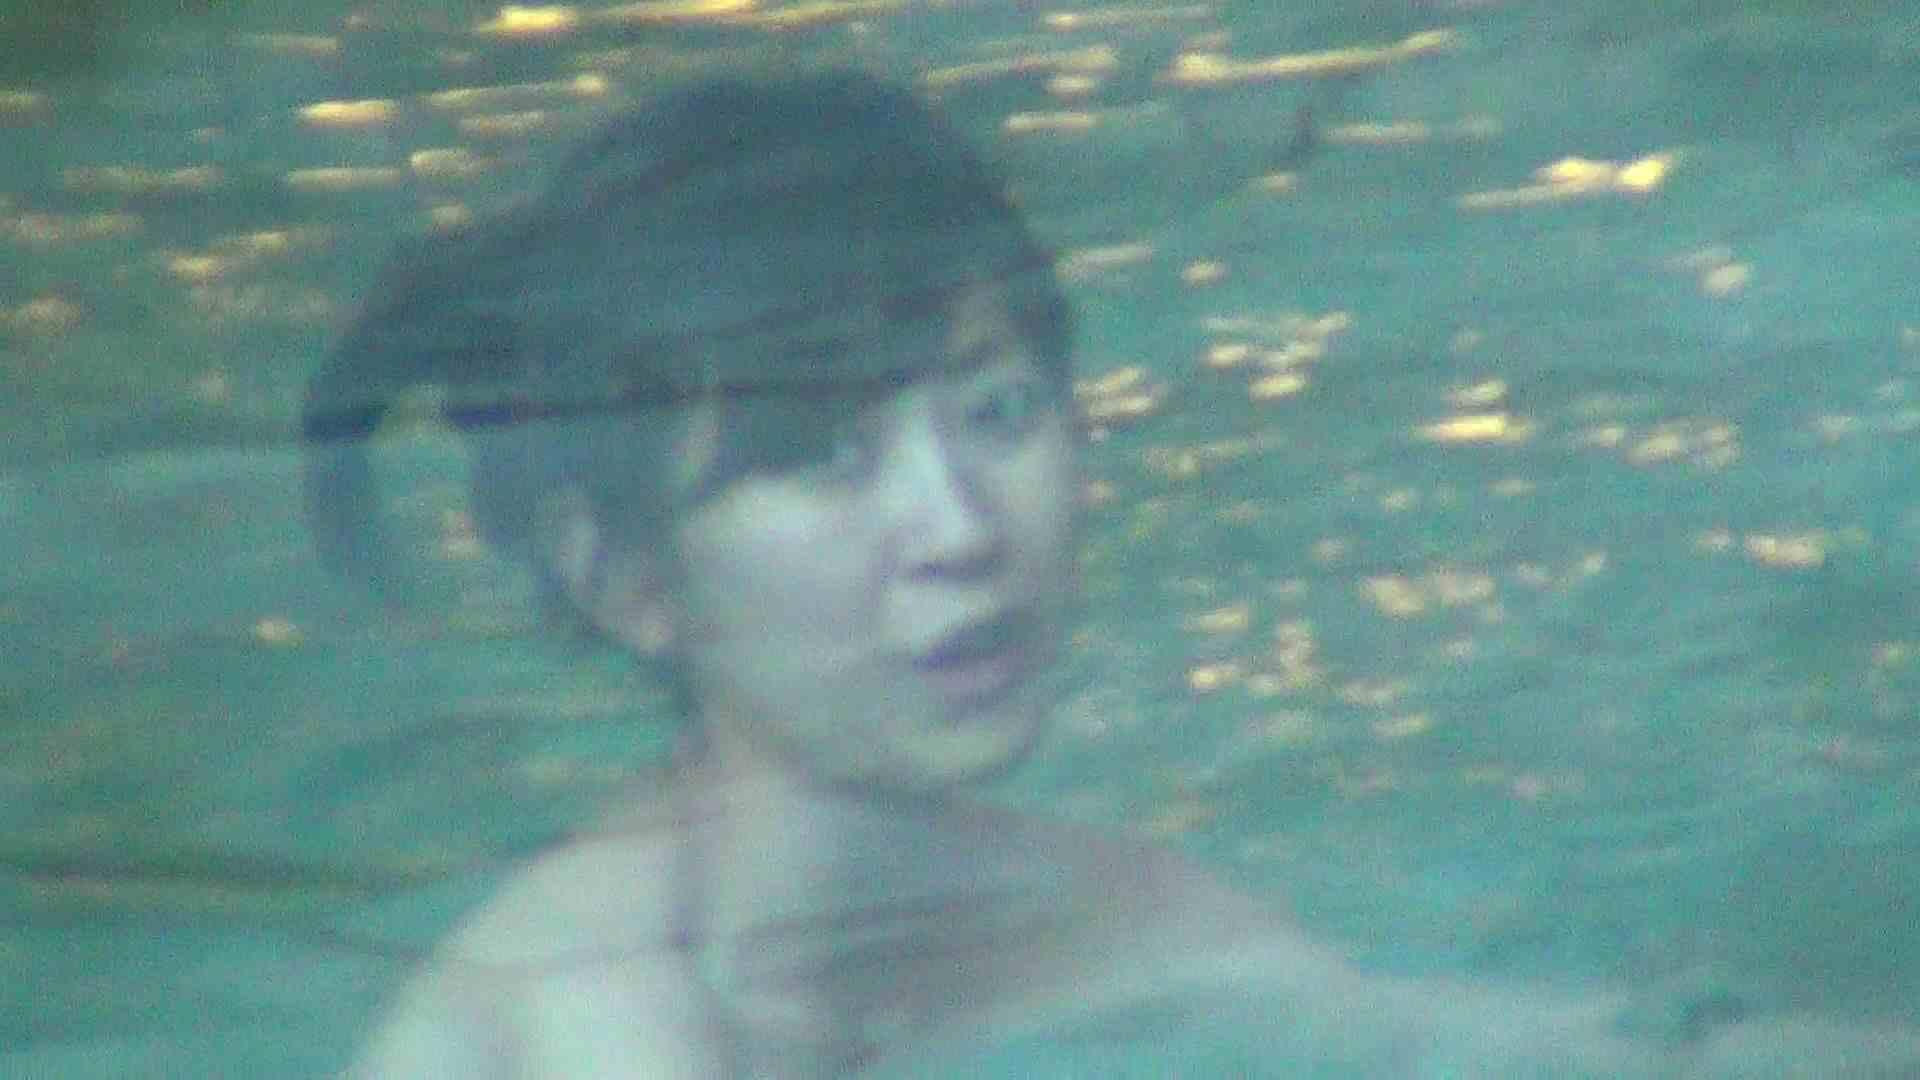 Aquaな露天風呂Vol.294 露天 セックス無修正動画無料 75画像 50